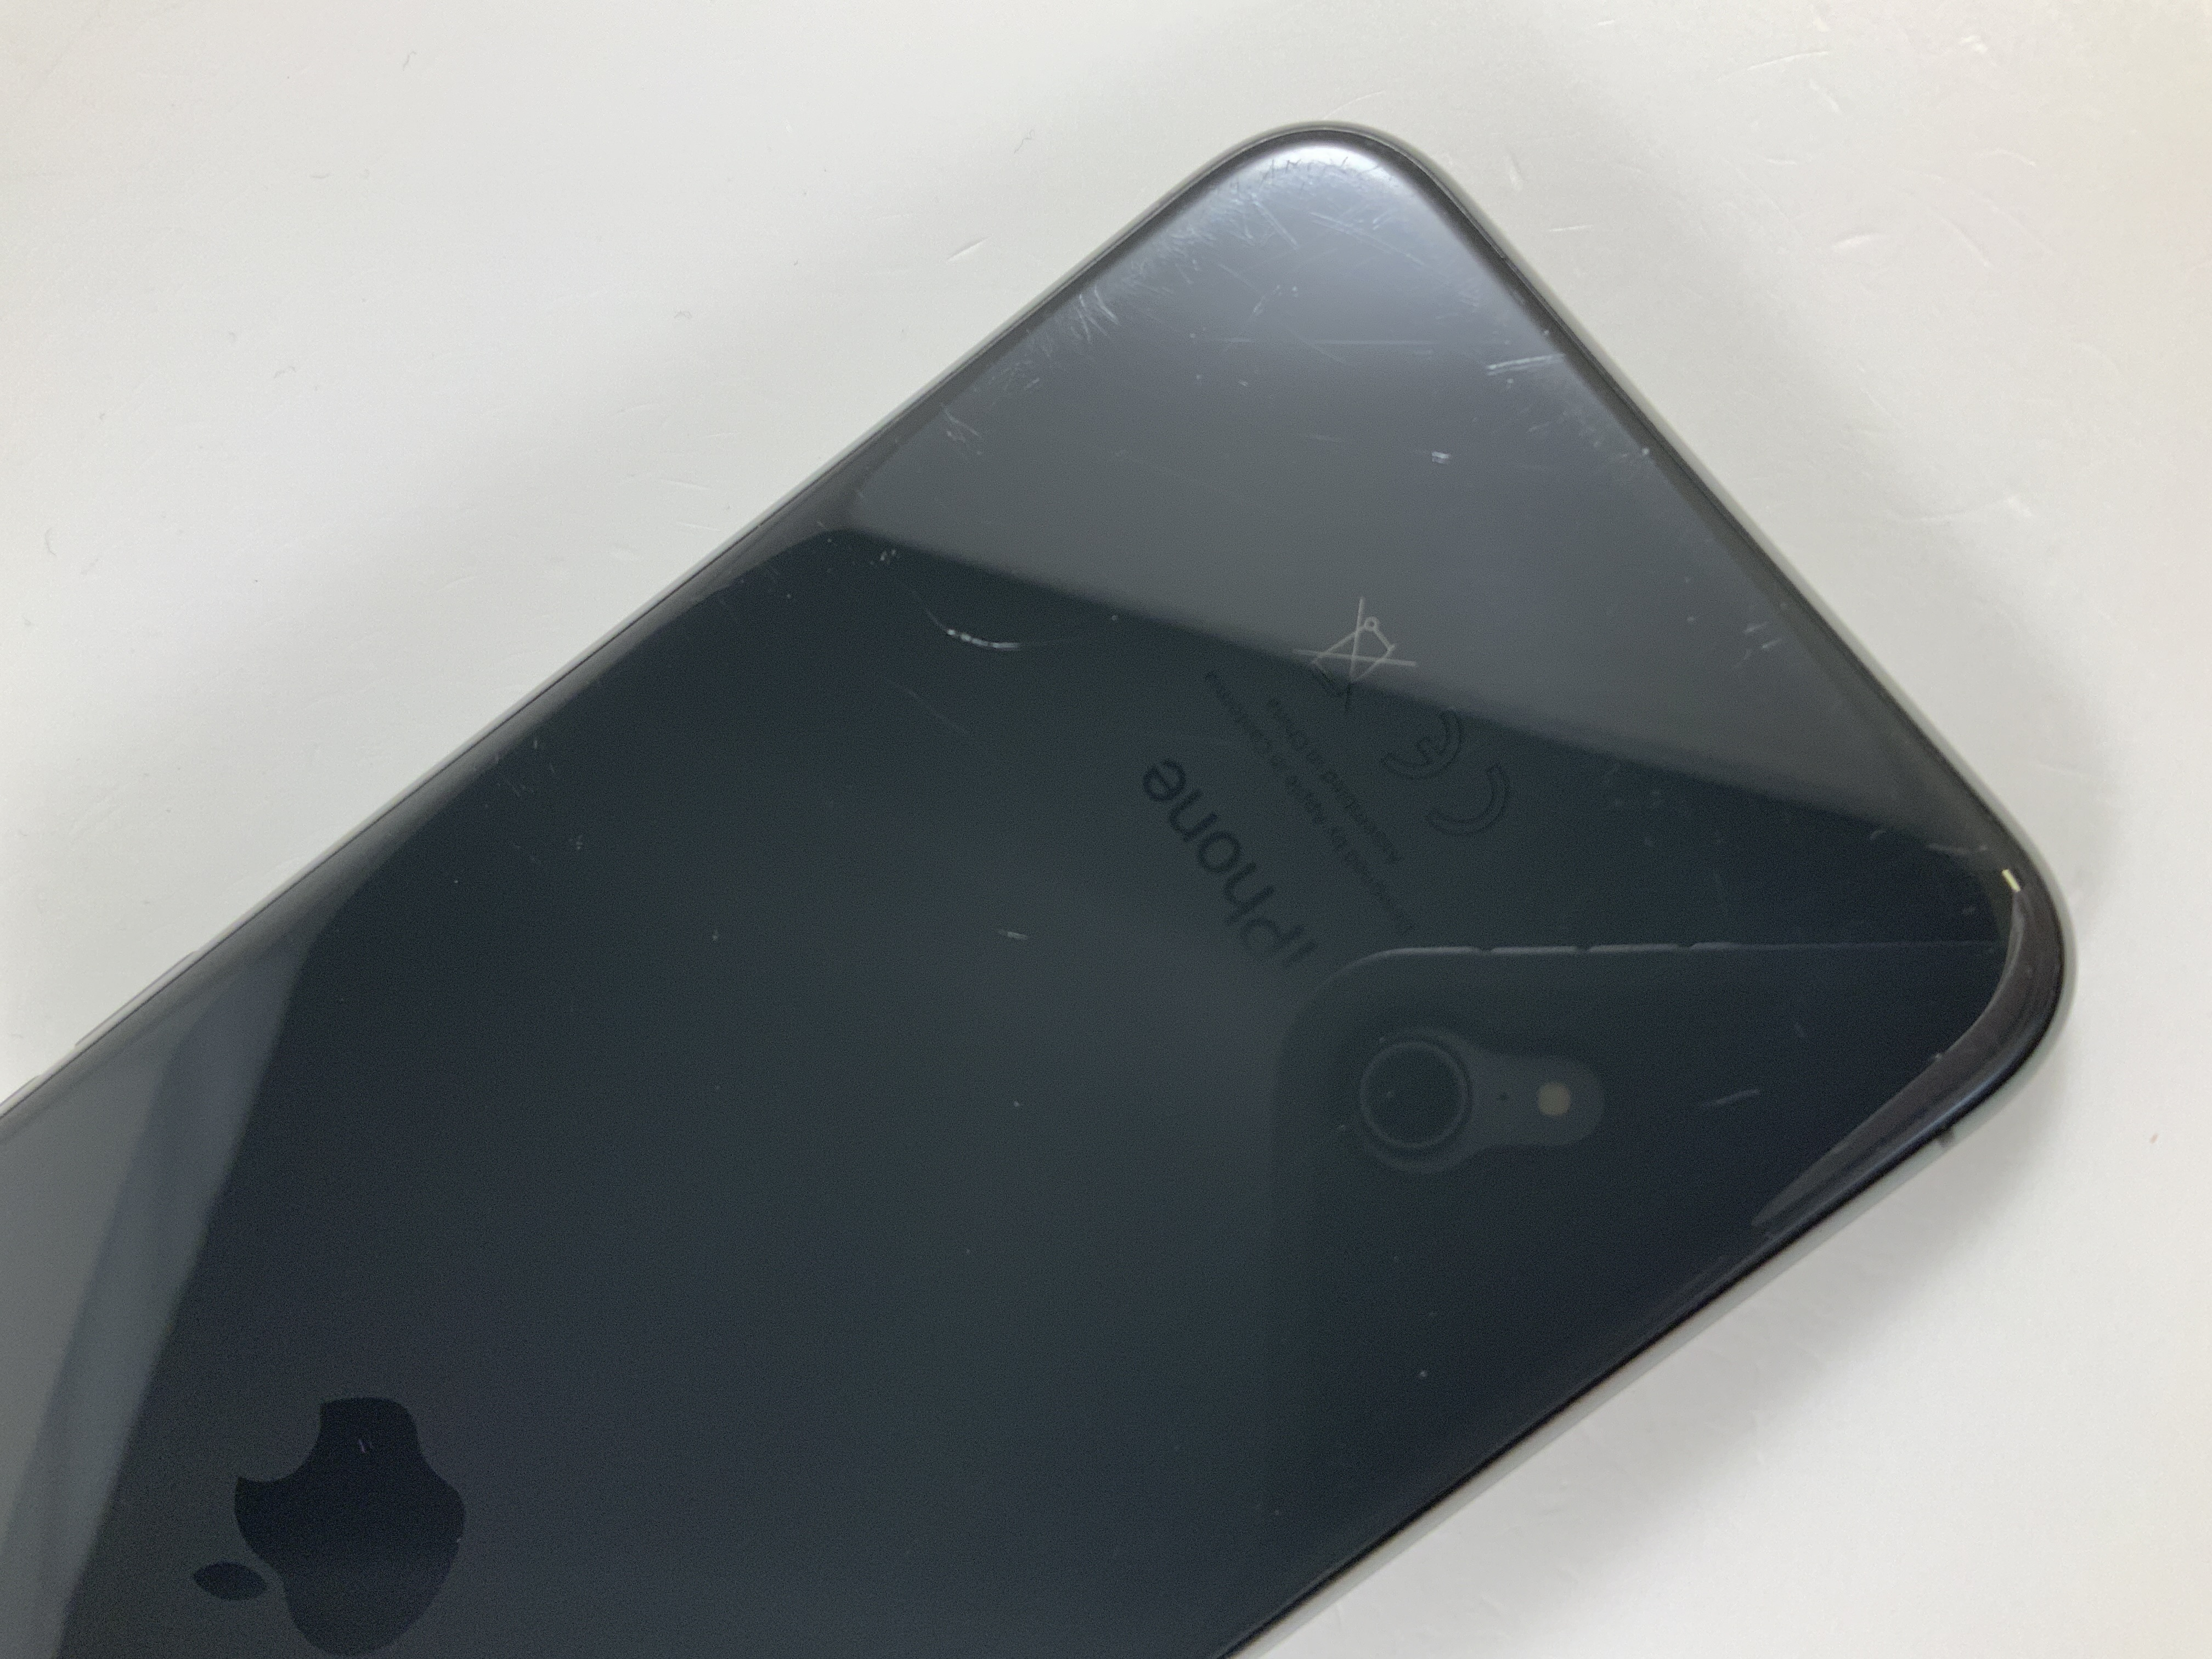 iPhone X 64GB, 64GB, Space Gray, Afbeelding 4